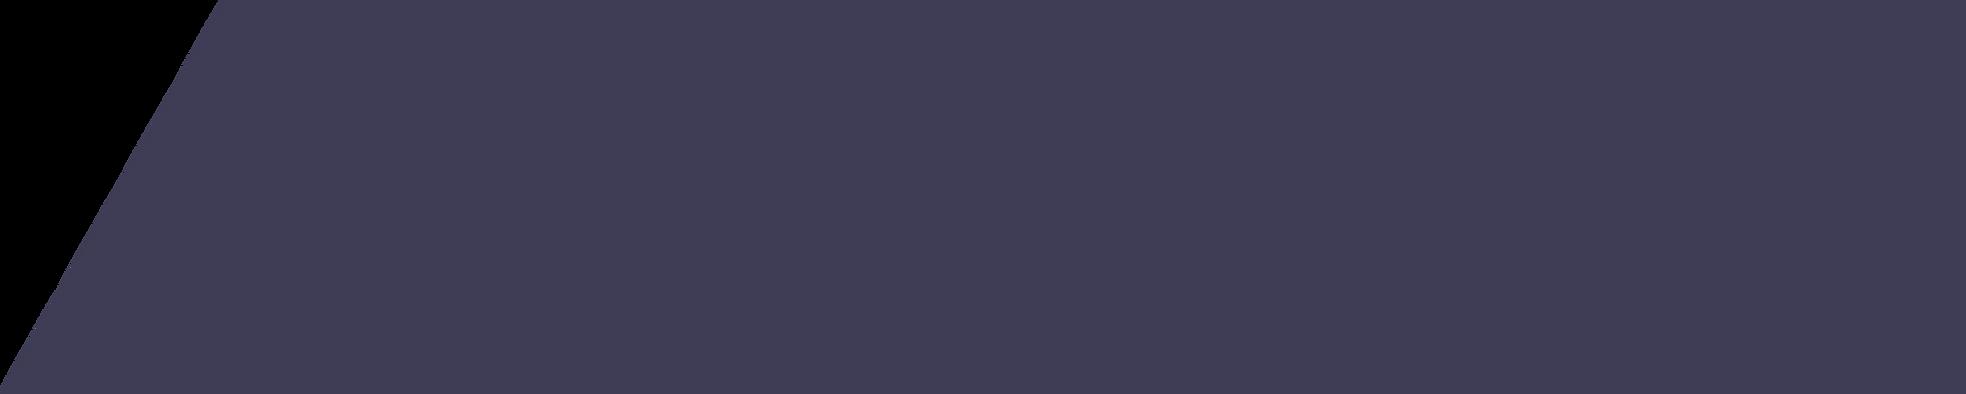 紫梯形右側.png